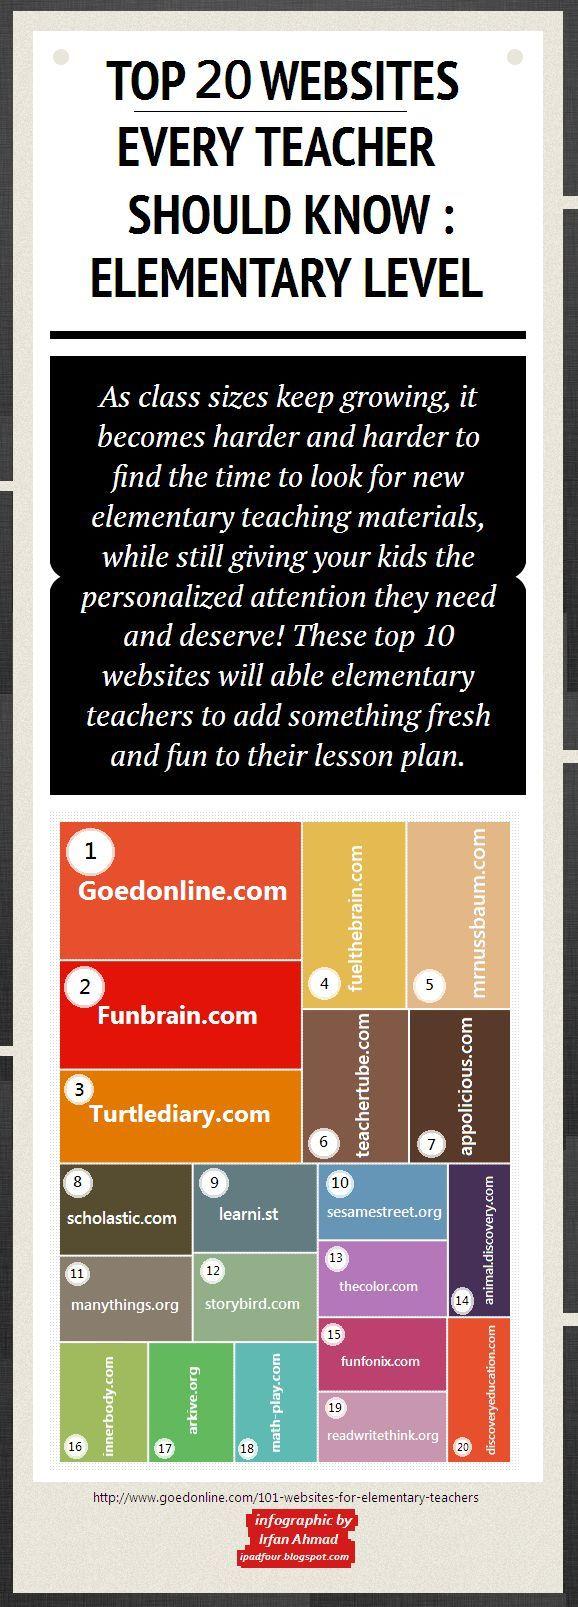 Teacher online dating sites